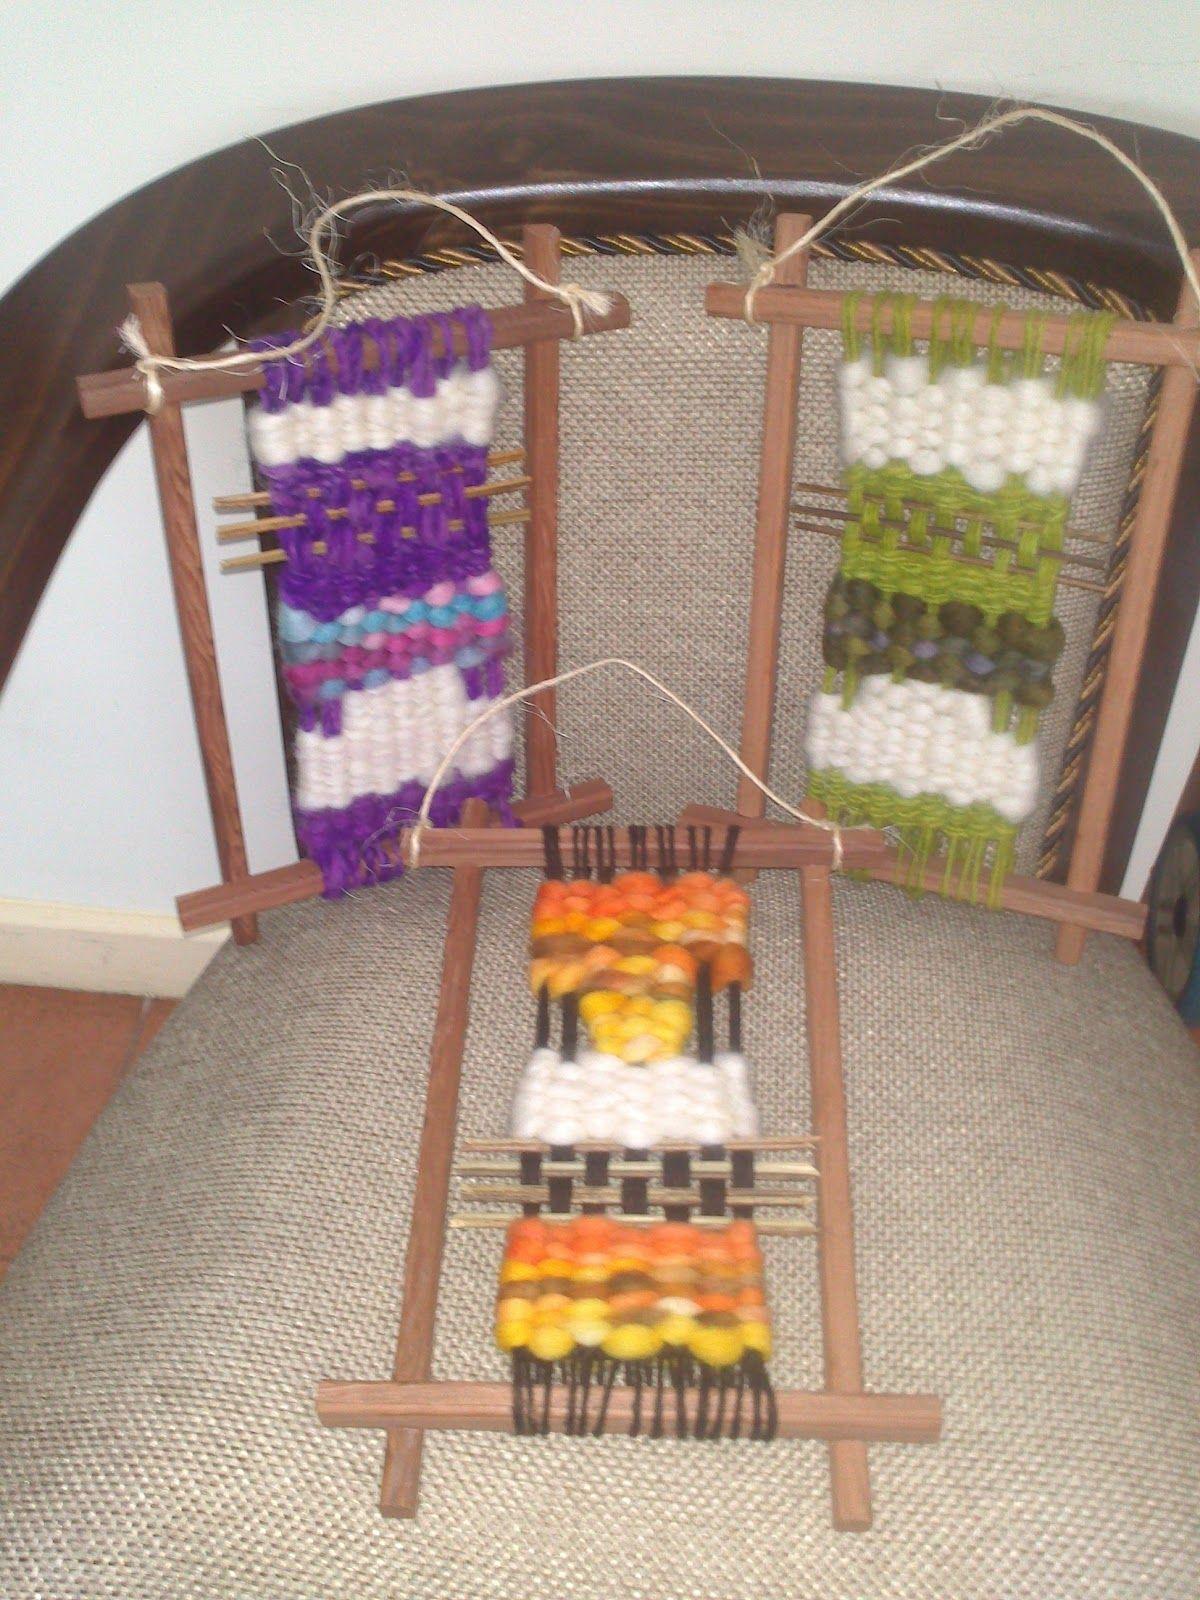 telar enmarcados lana de oveja   Arte   Pinterest   Telar, Oveja y Lana